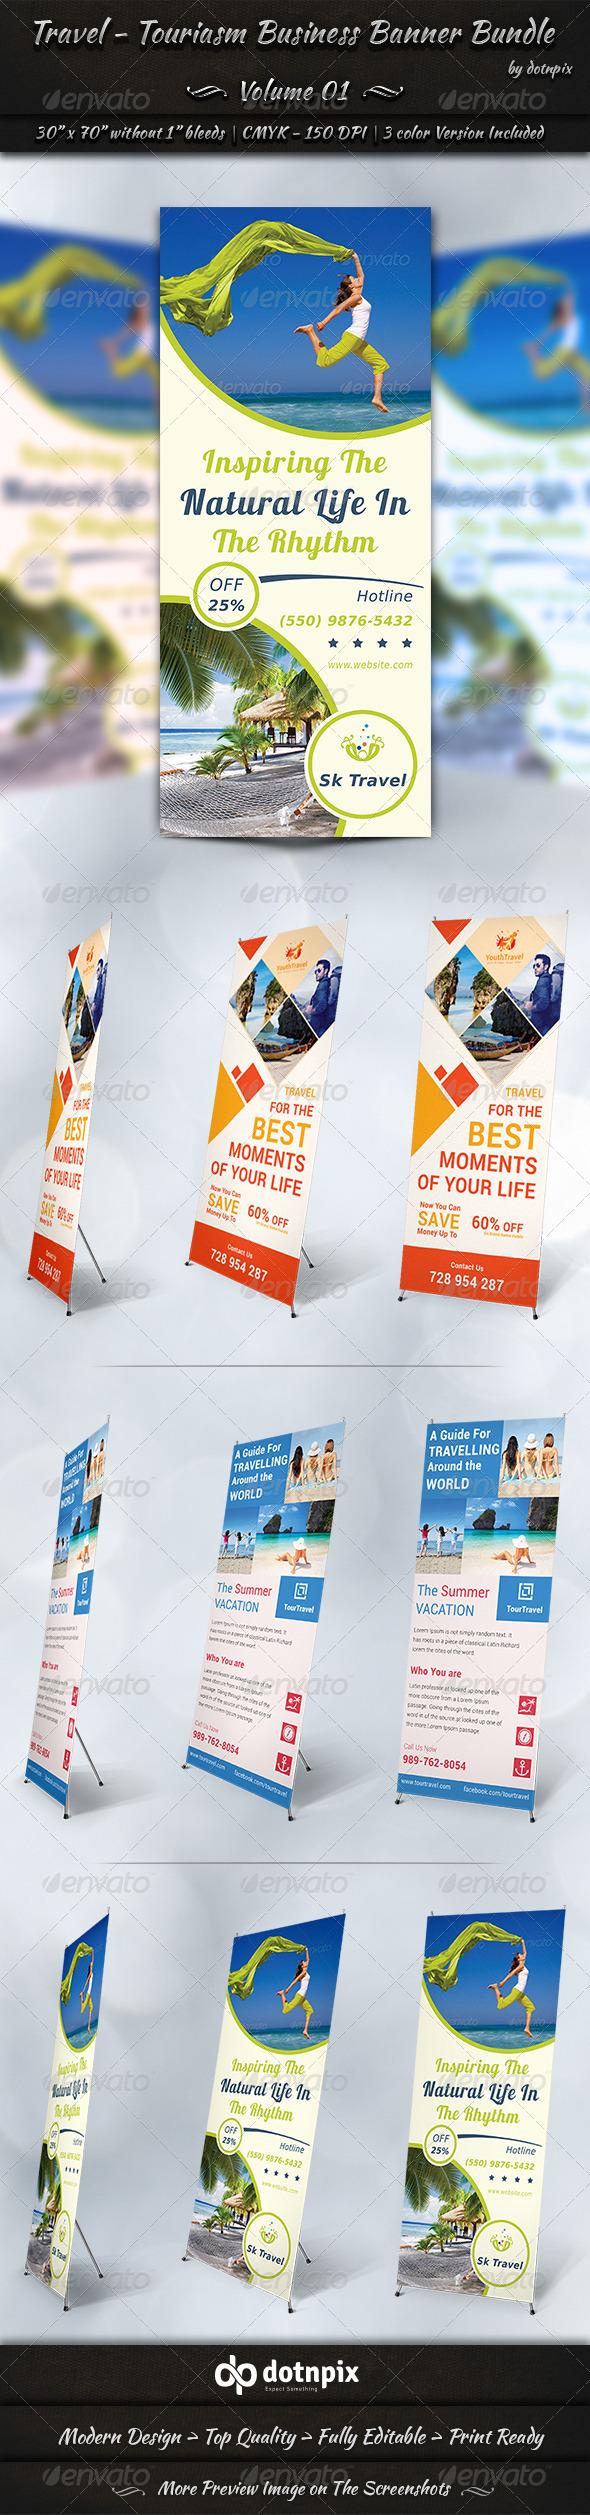 GraphicRiver Travel Tourism Business Banner Bundle Volume 1 7347553